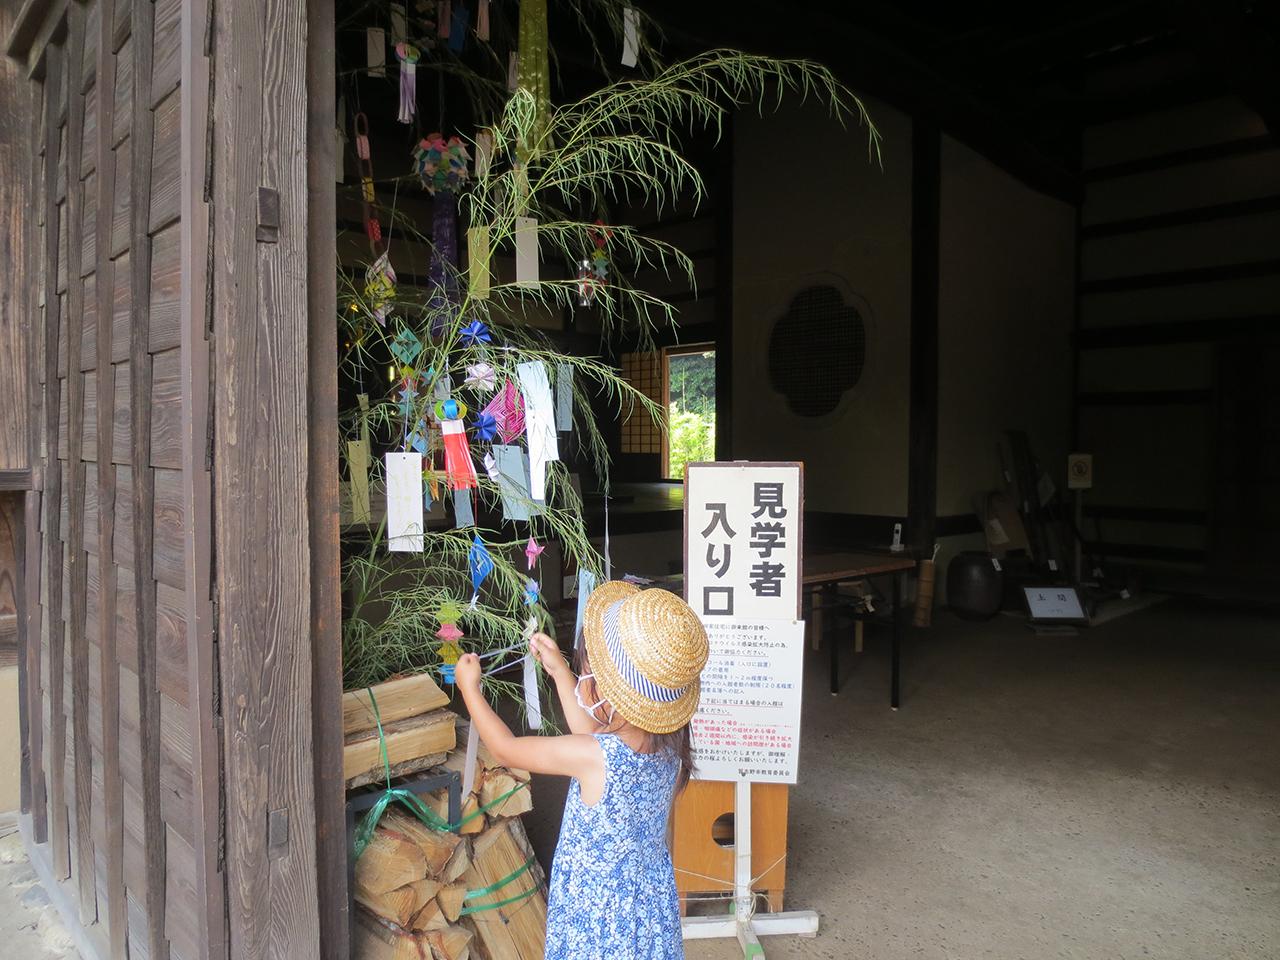 実籾本郷公園の投稿写真5